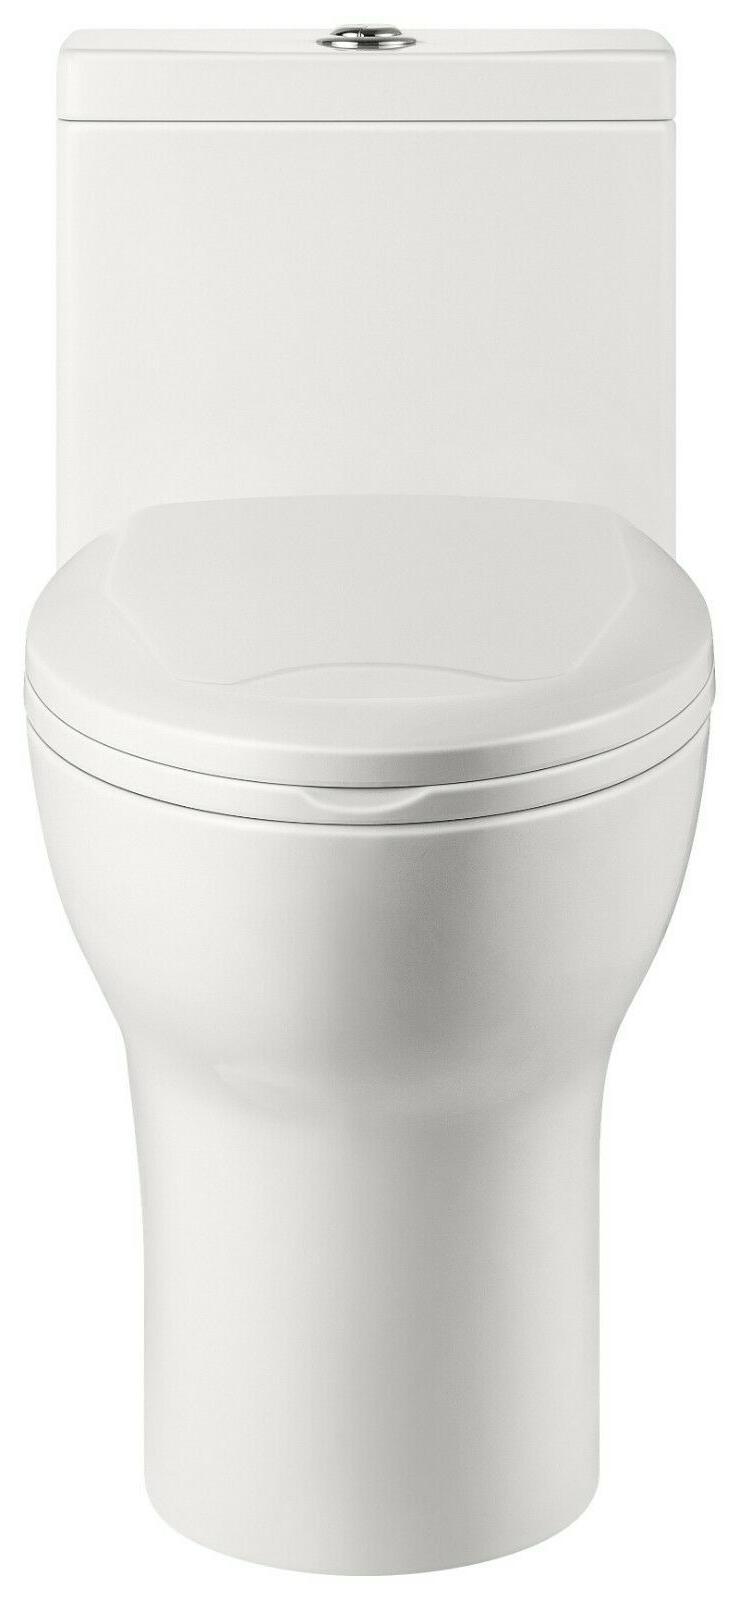 DeerValley Elongated Porcelain Toilet w/ Closing